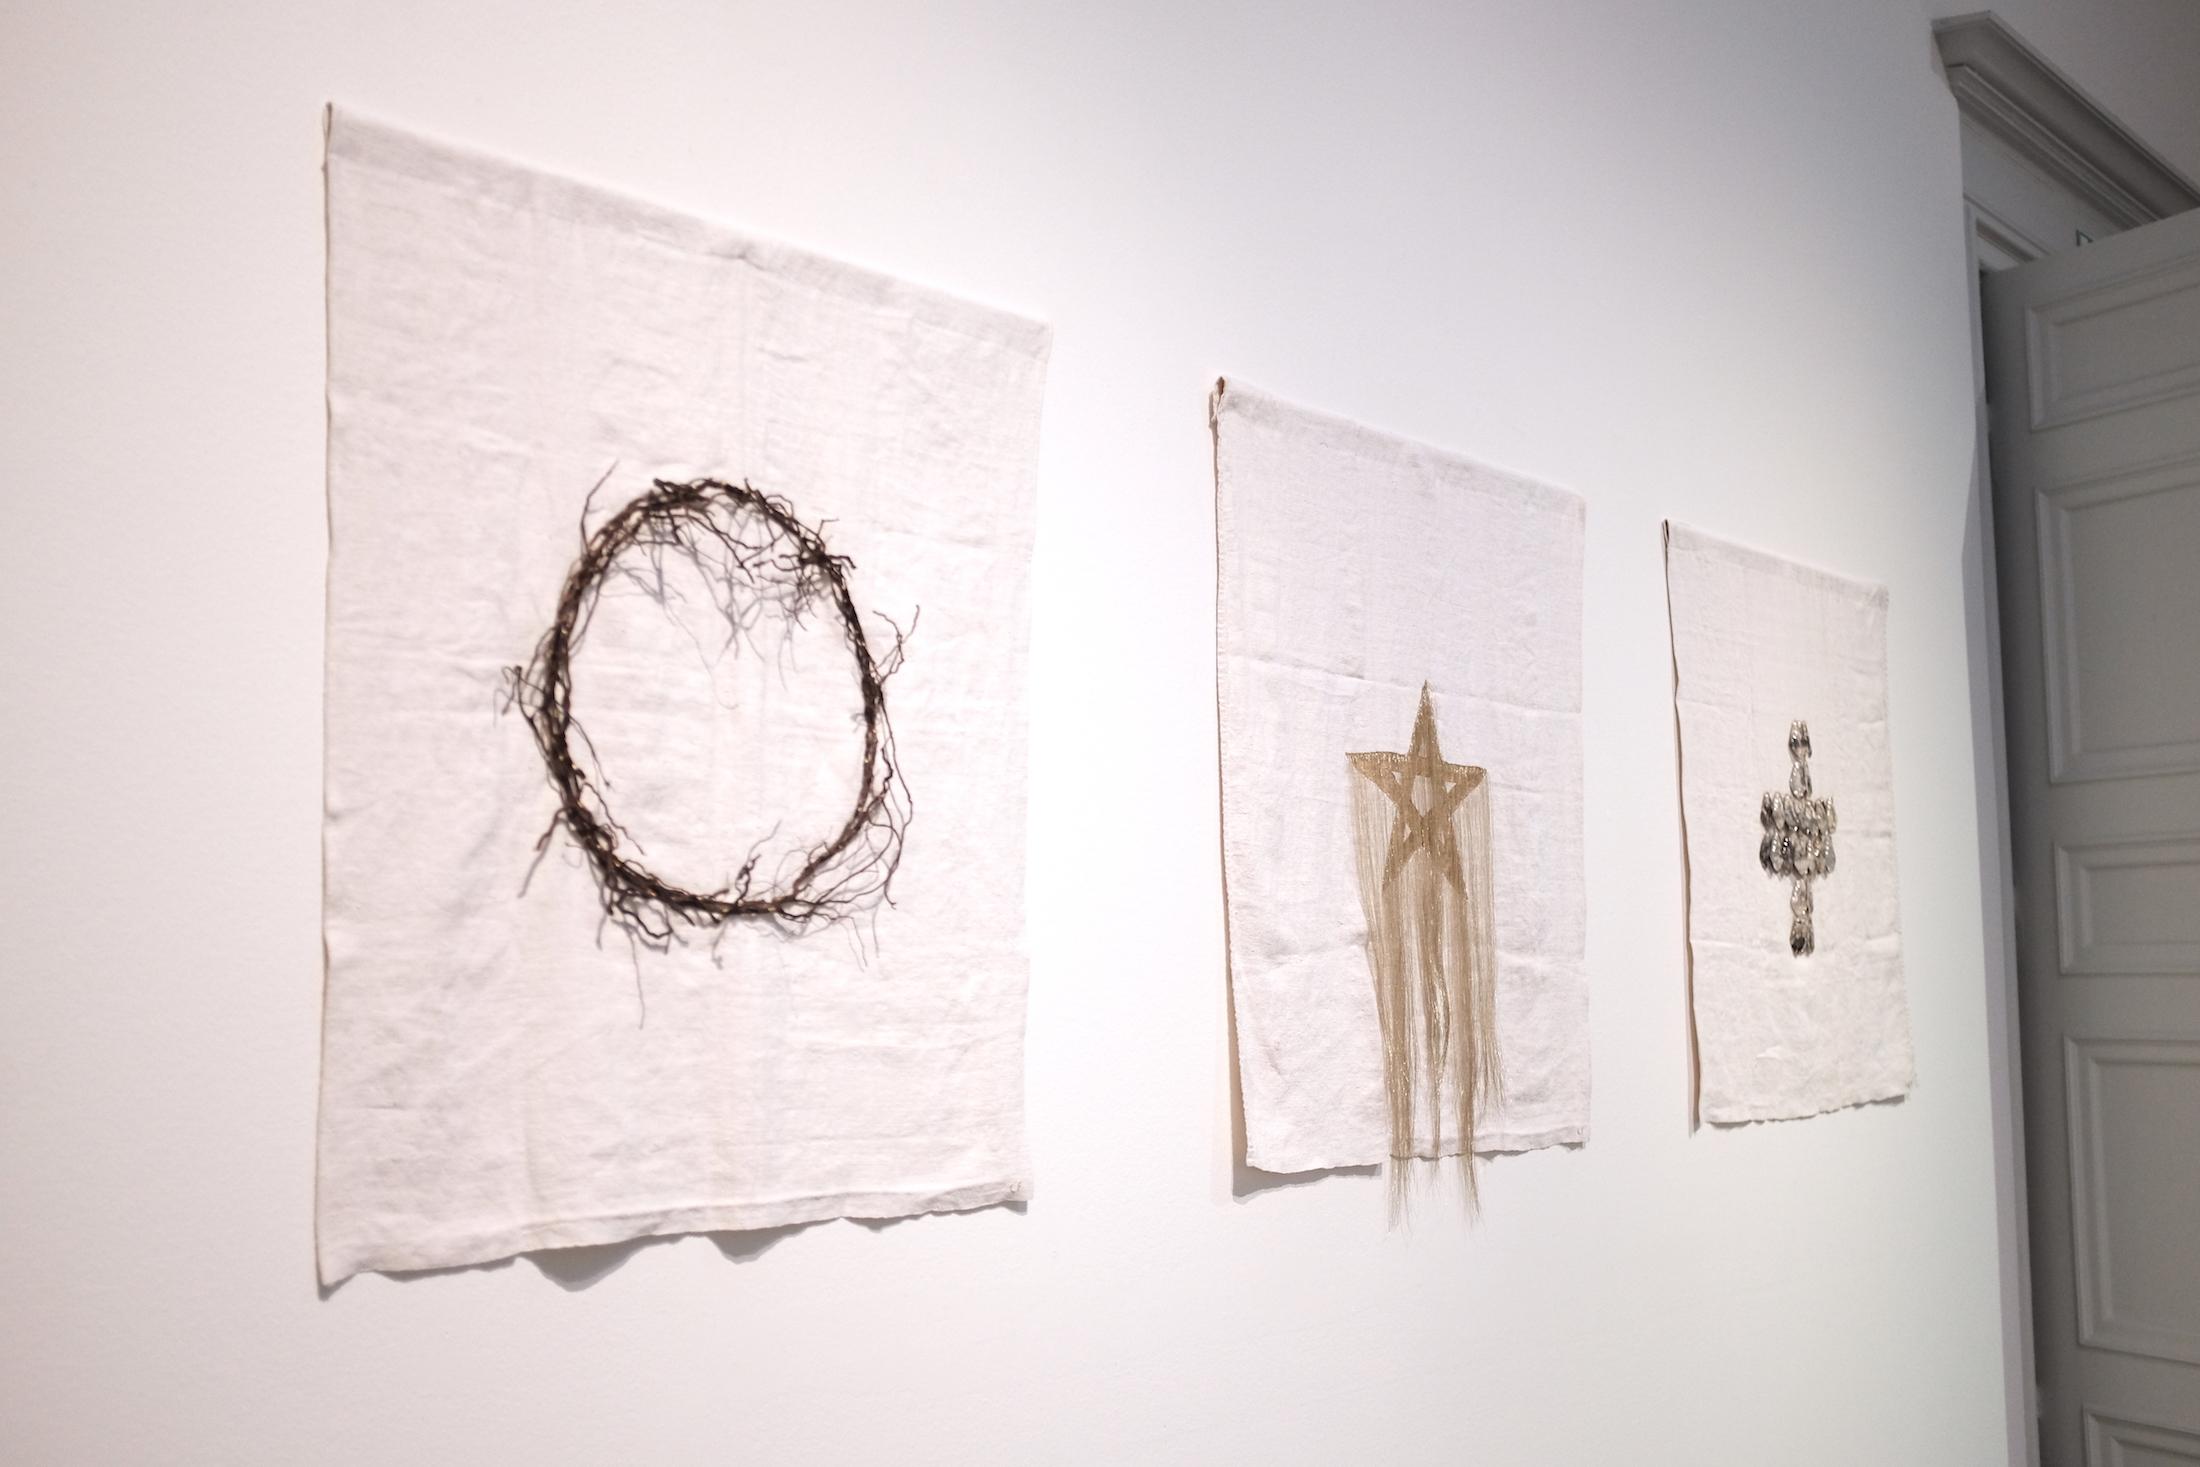 Christine Ferrer, Untitled, 2018